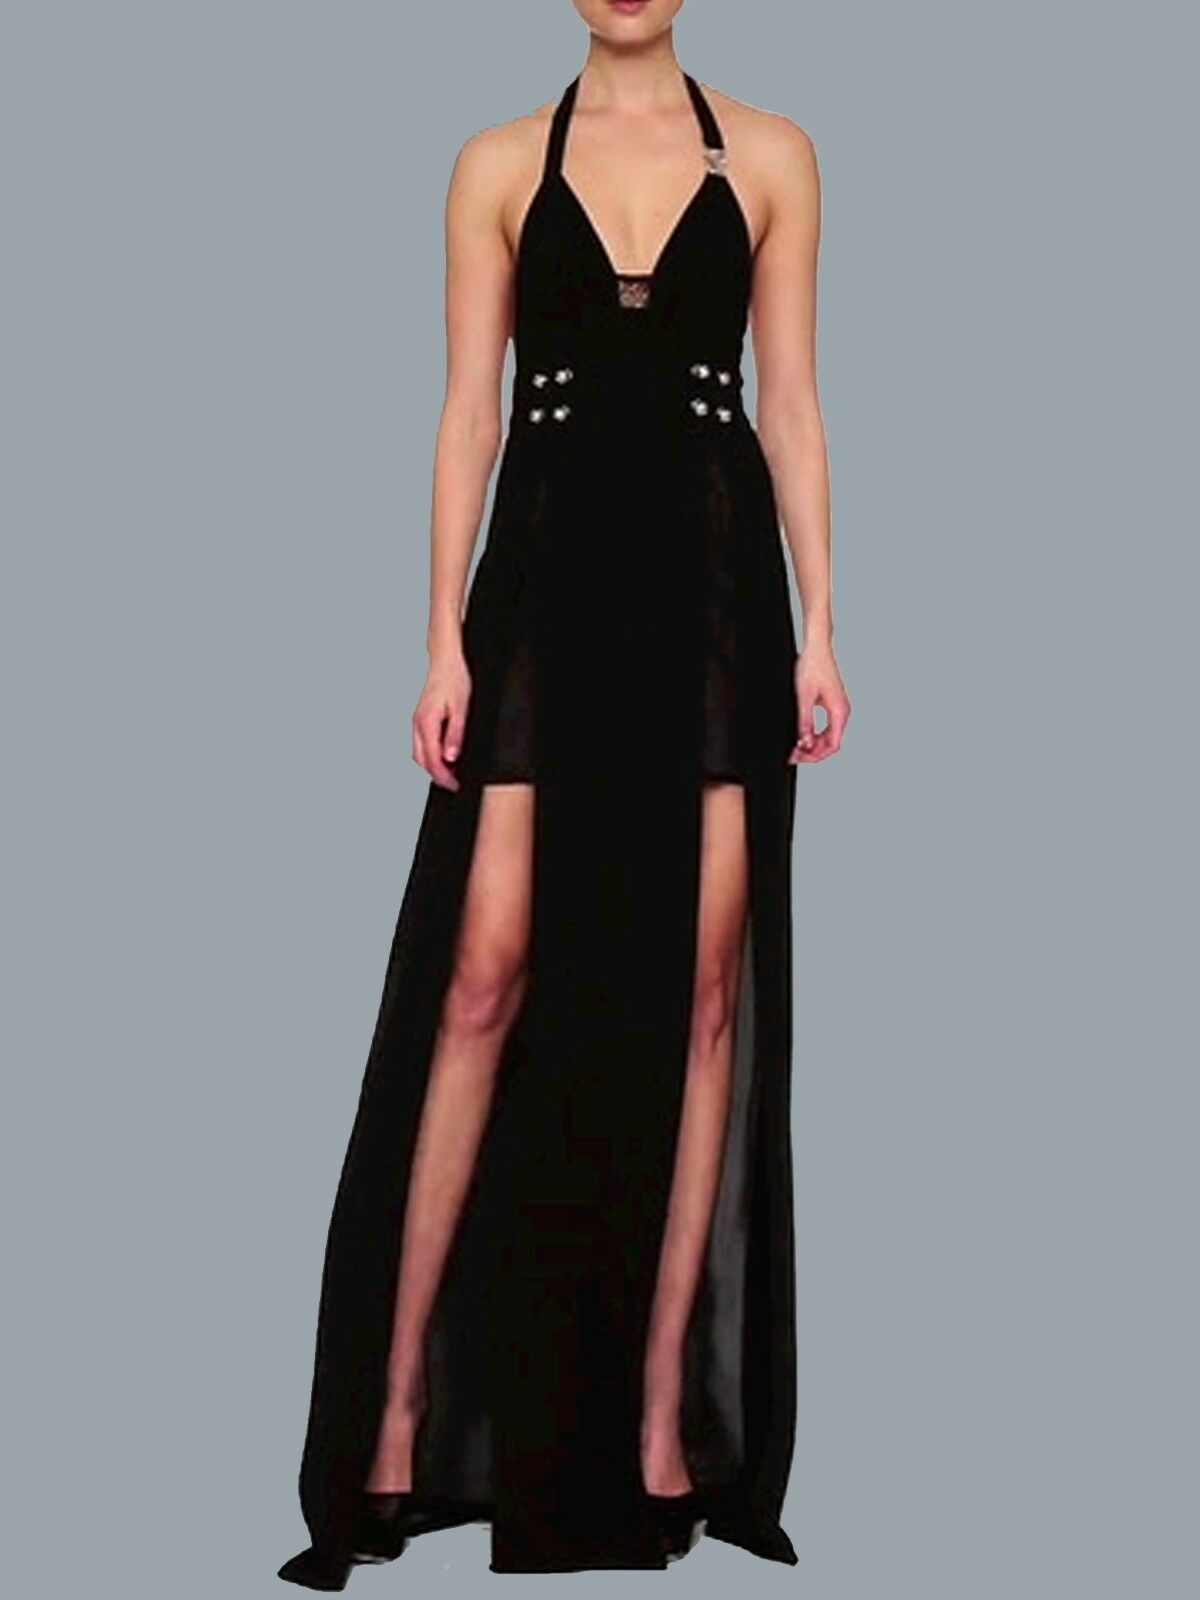 Versace Versus Black Halter Maxi Dress as Seen on Irina Shayk | eBay